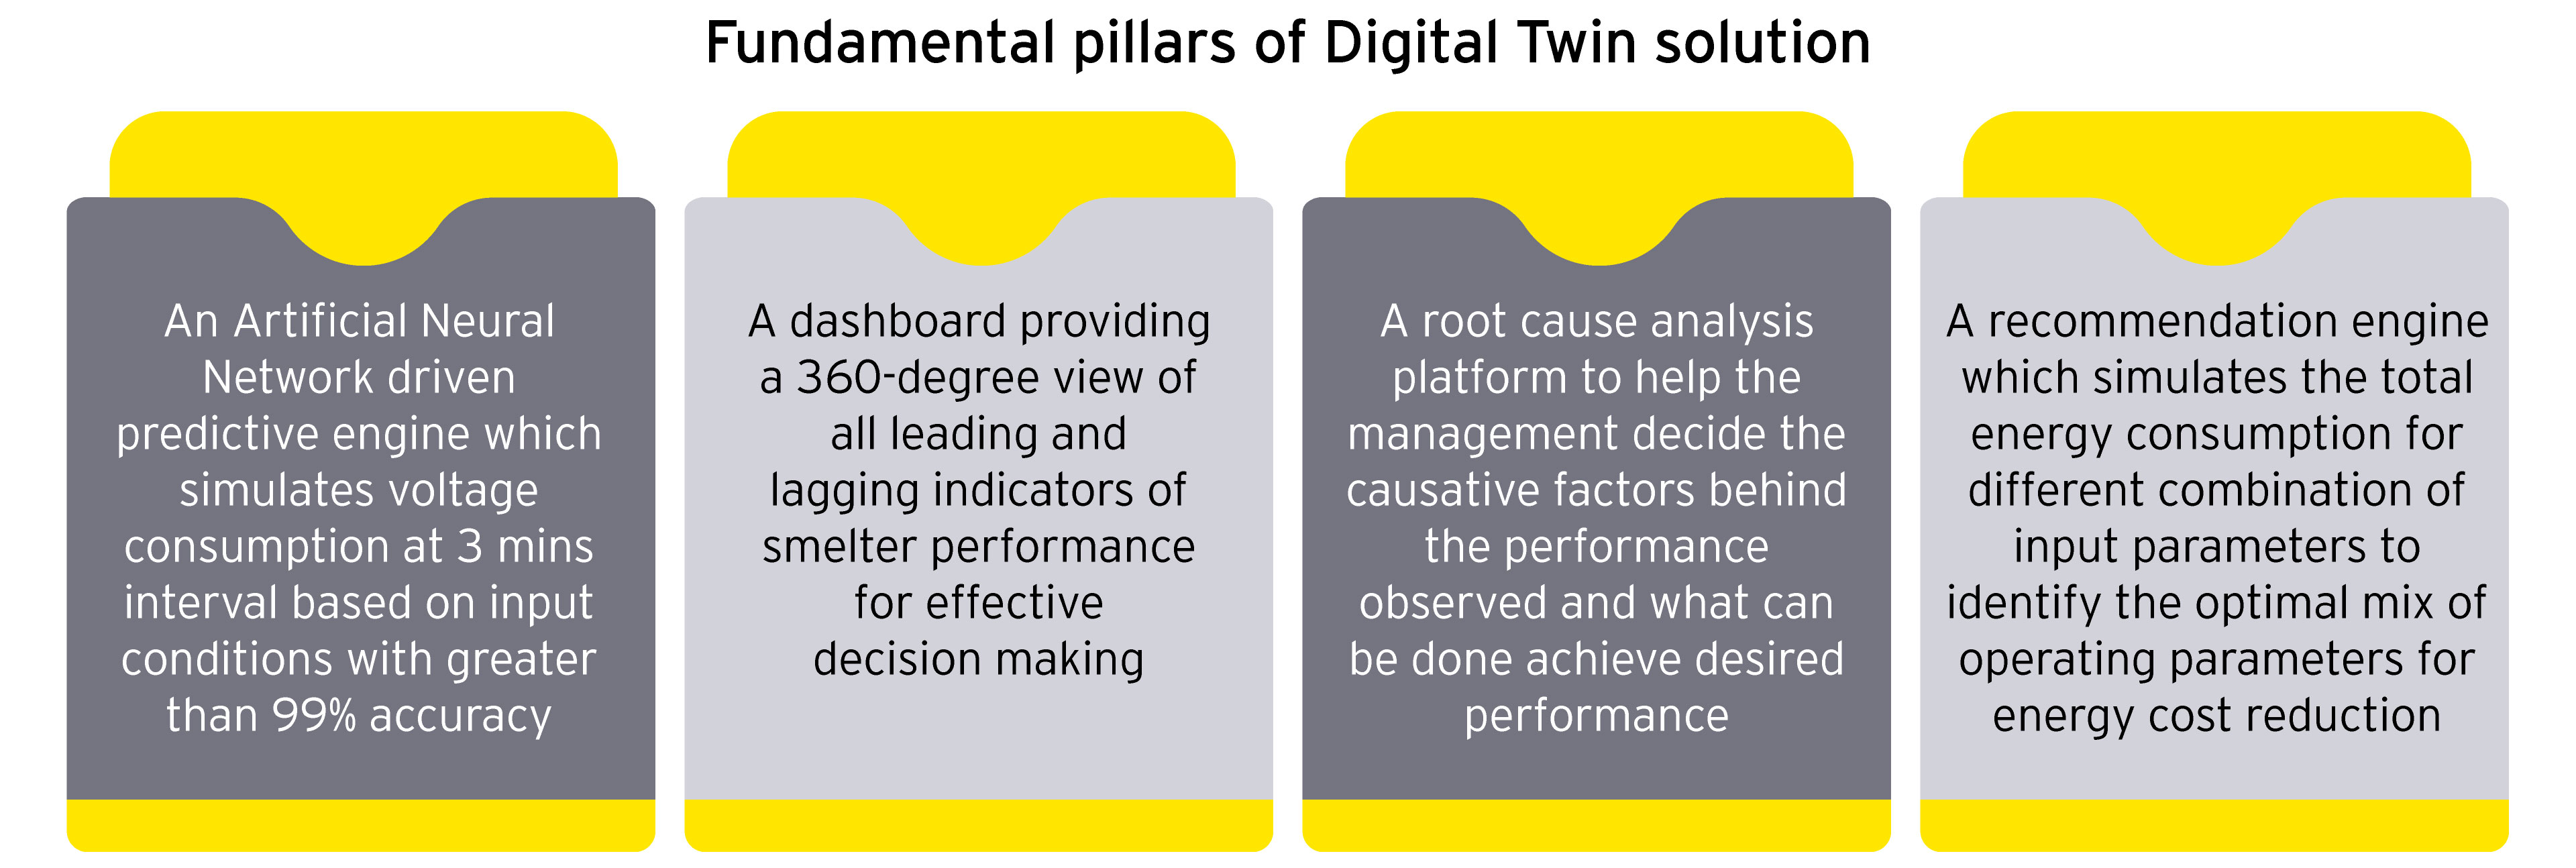 Fundamental pillars of Digital Twin solution